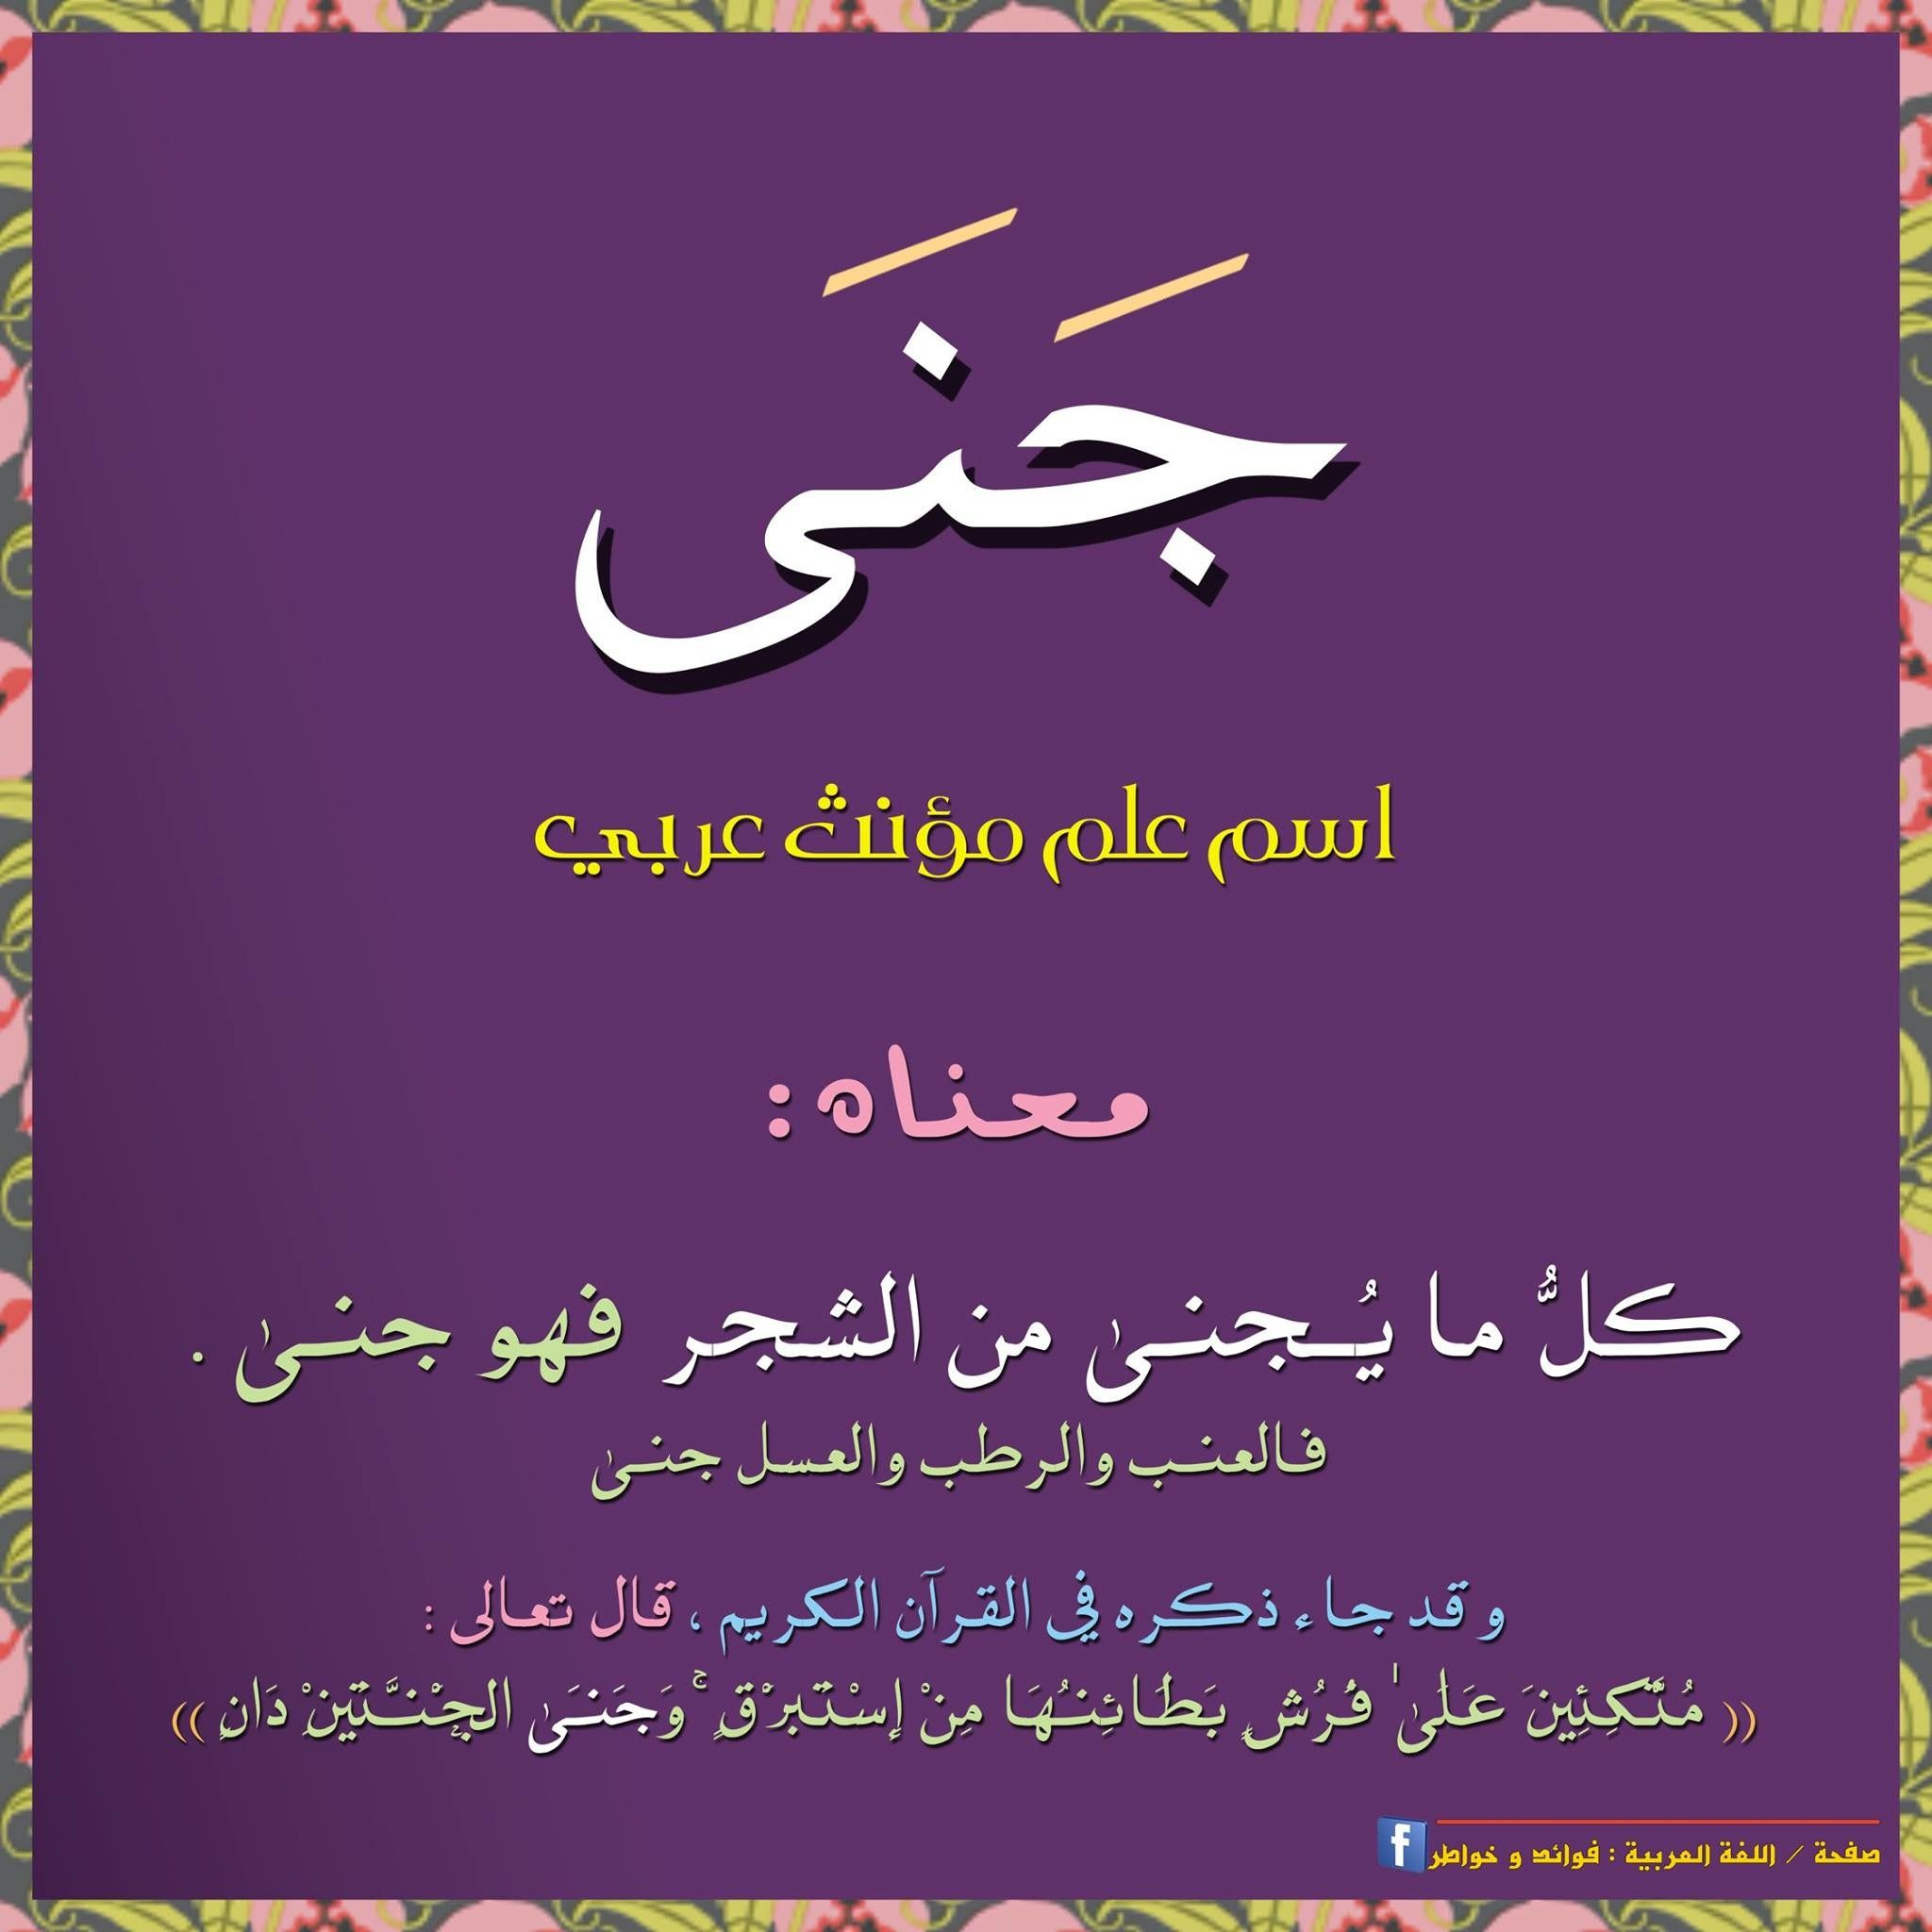 Pin By Mum Mero On ٥٥ سورة الرحمن Learn Arabic Language Words Arabic Baby Girl Names